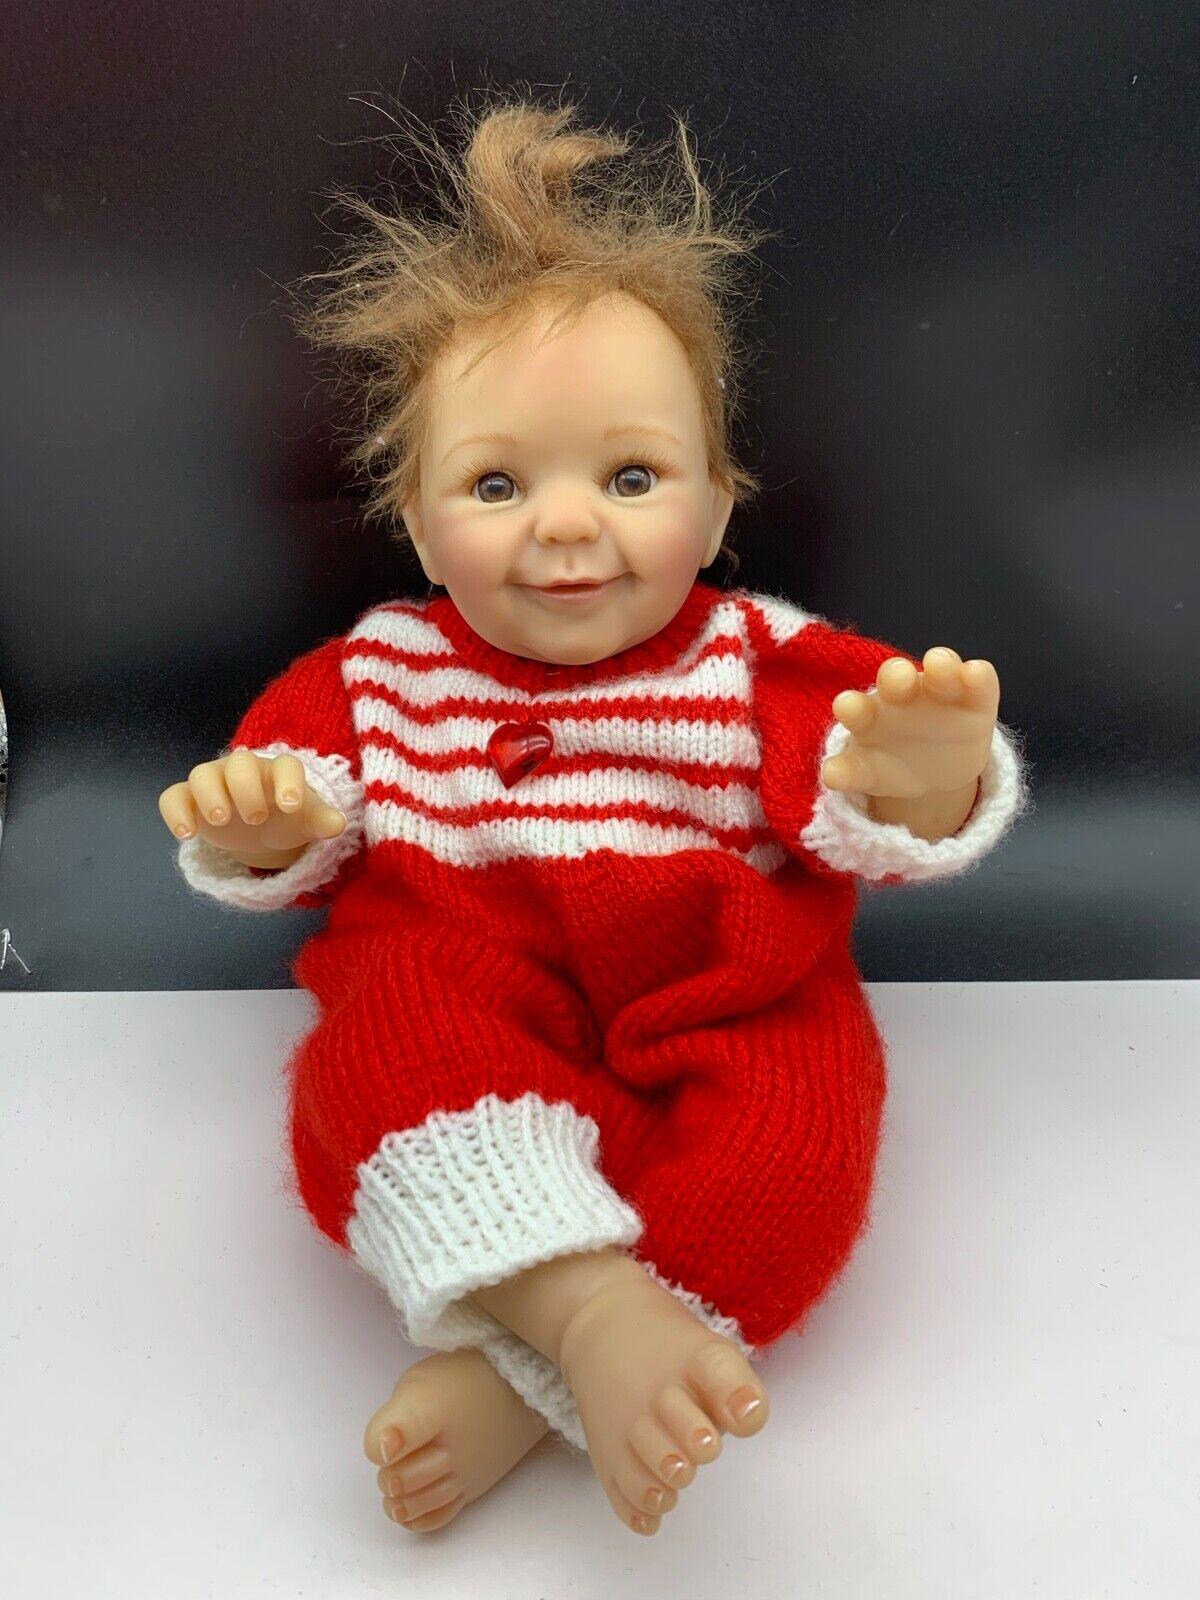 Cheryl Hill Vinyl Artistic Doll Doll 43 Cm. Top Condition